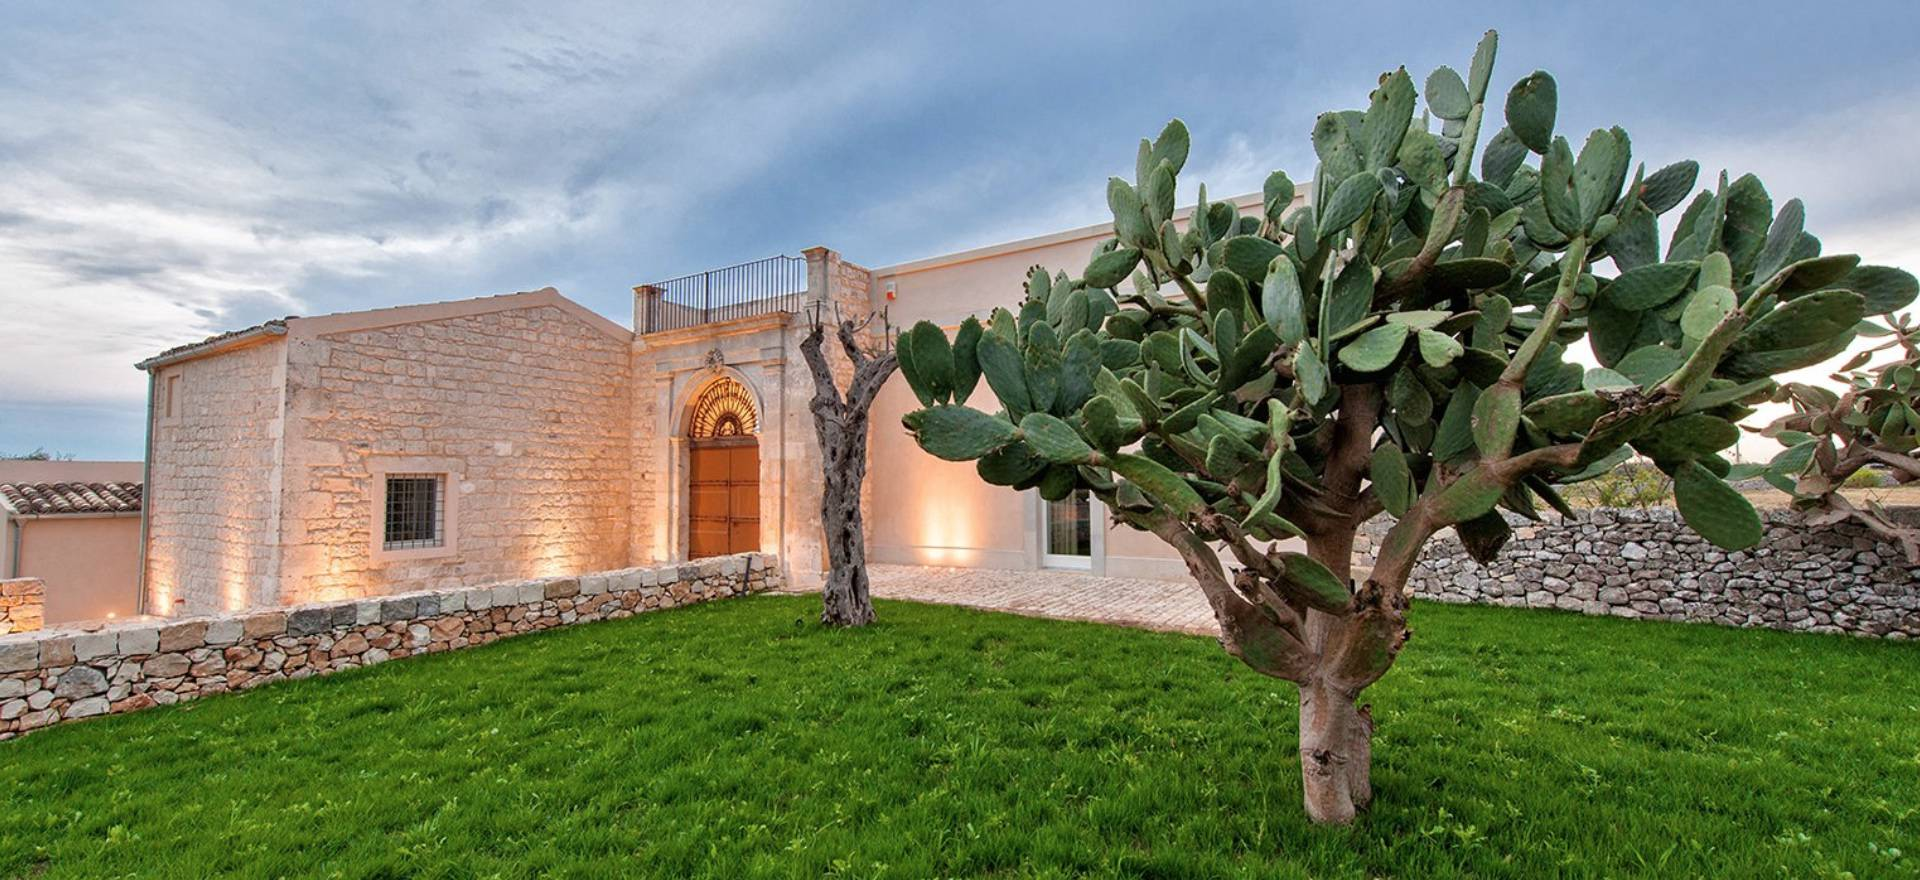 Agriturismo Sicilie Gerestaureerde agriturismo met goed Siciliaans restaurant